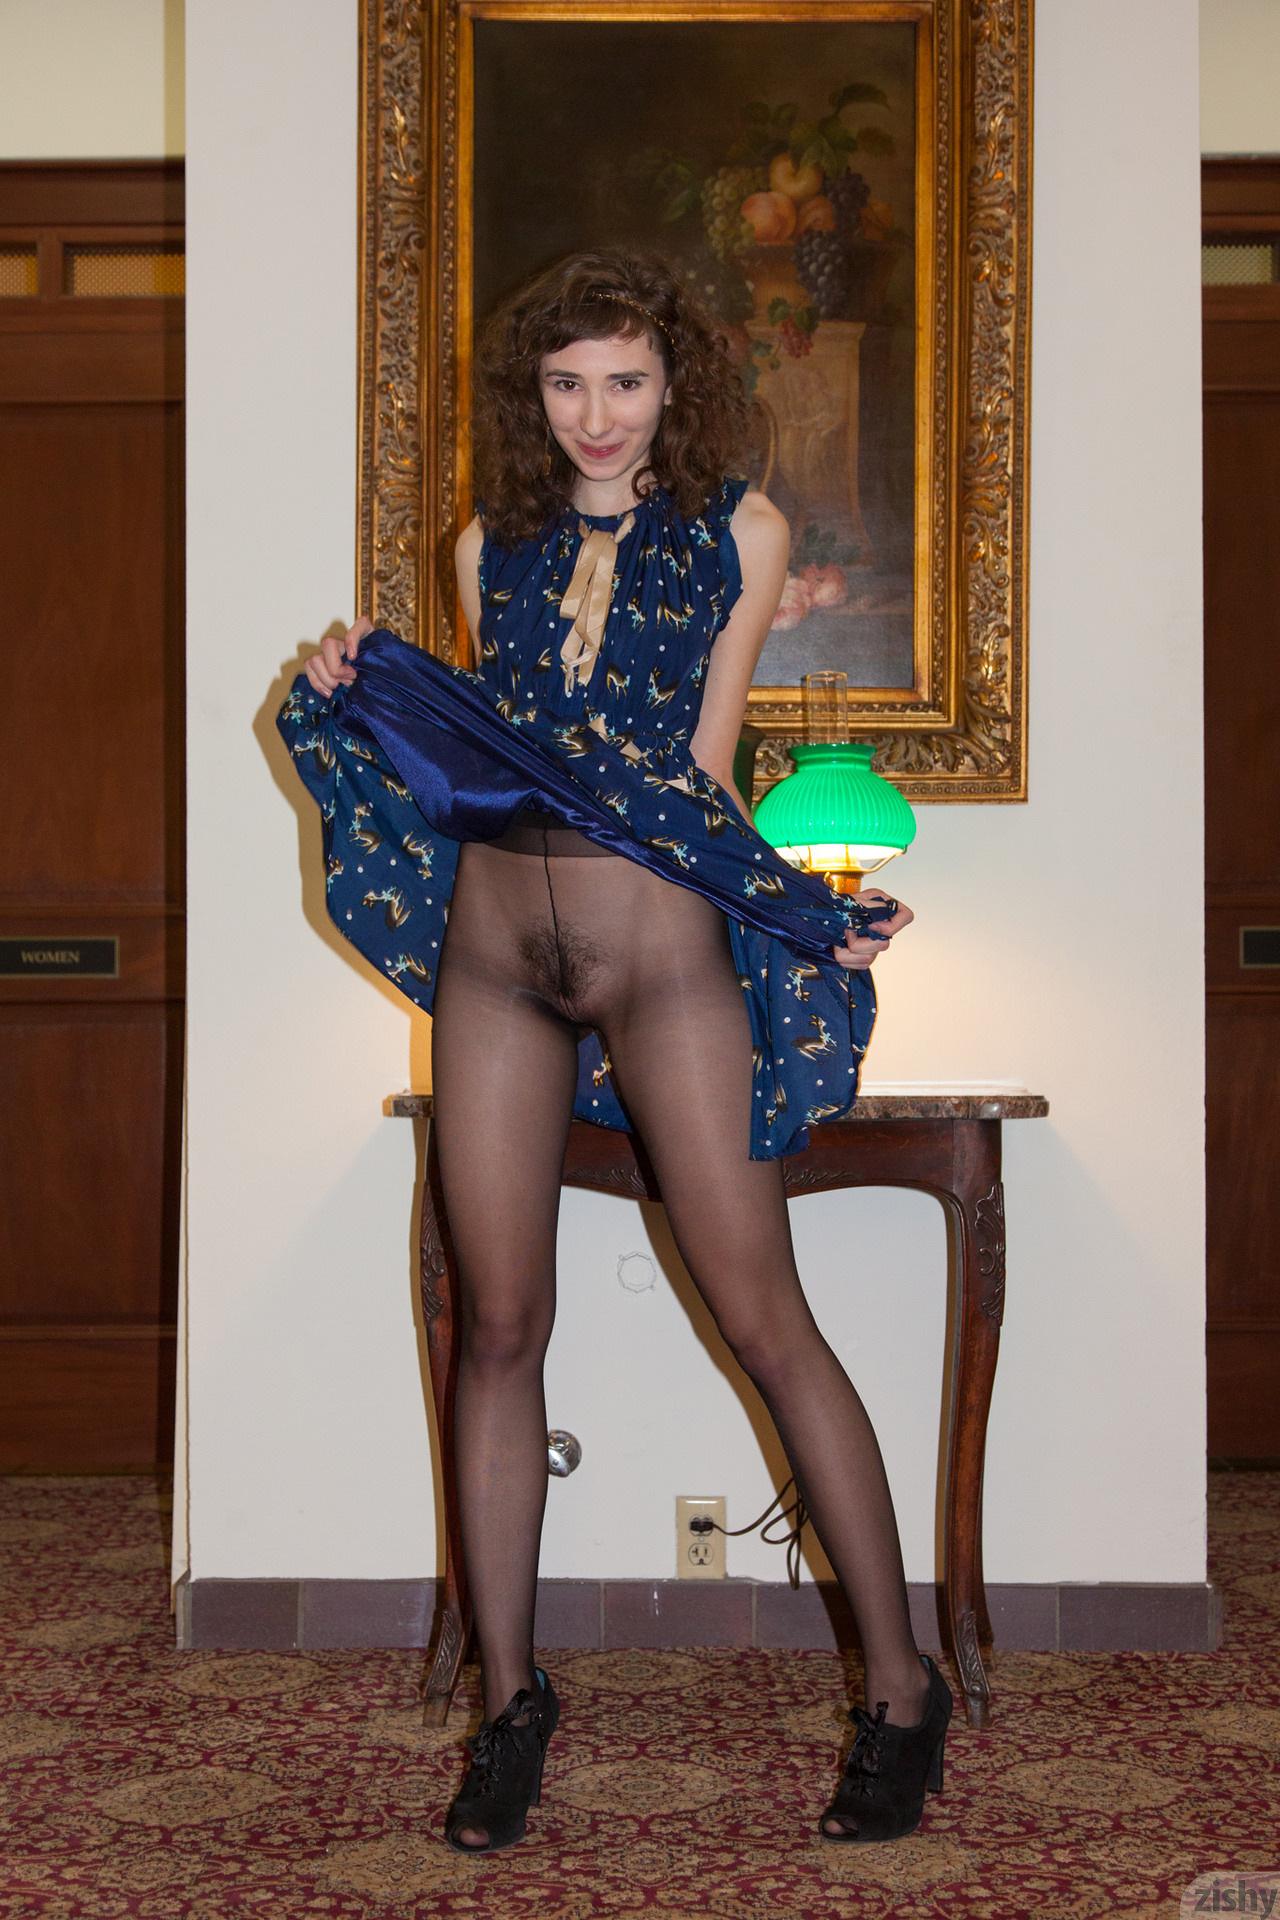 Yvette Nolot At Arizona Inn Zishy (22)